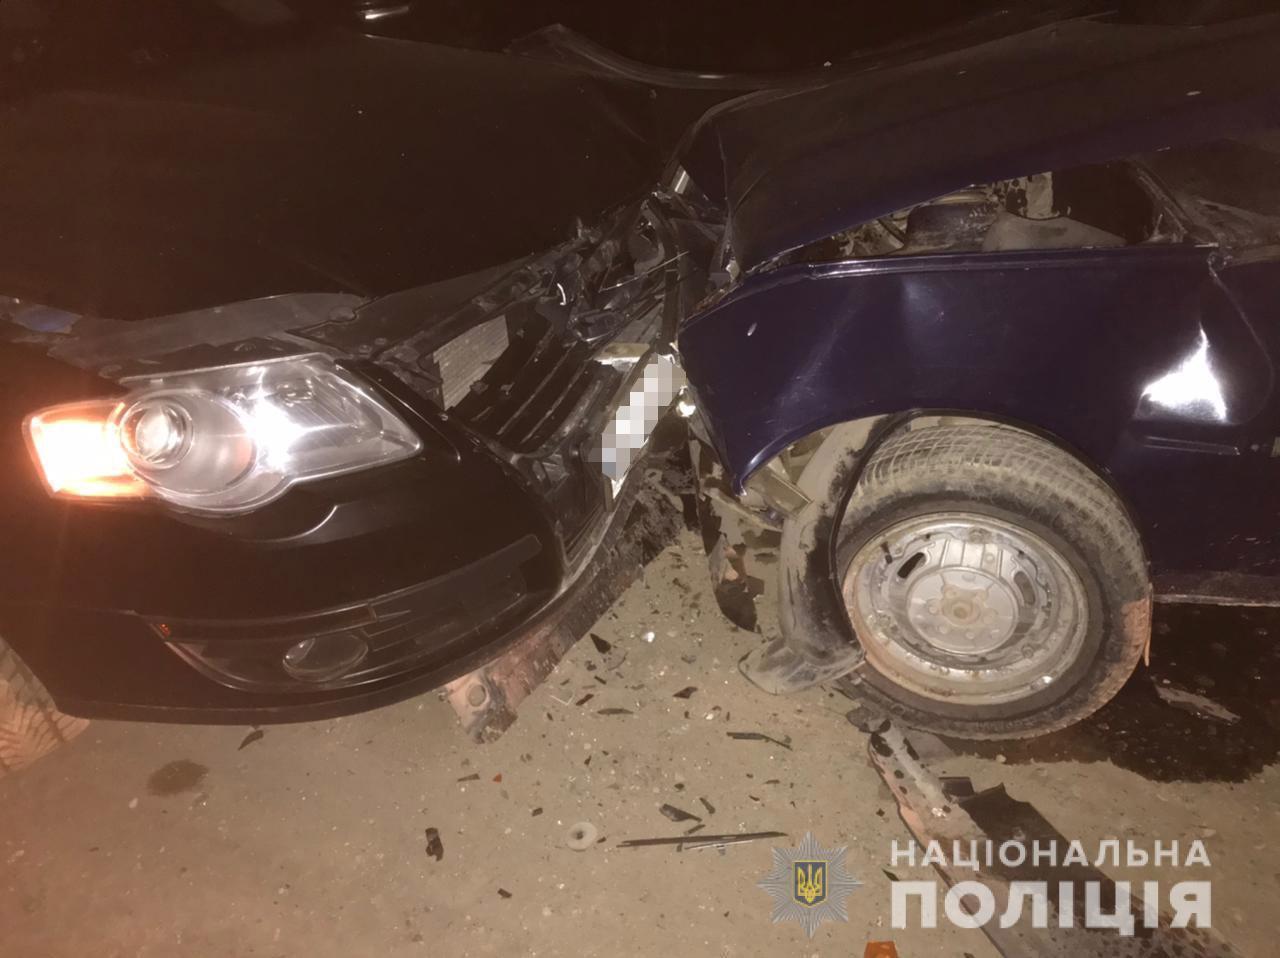 В ДТП на Львовщине пострадали две девушки-пассажирки